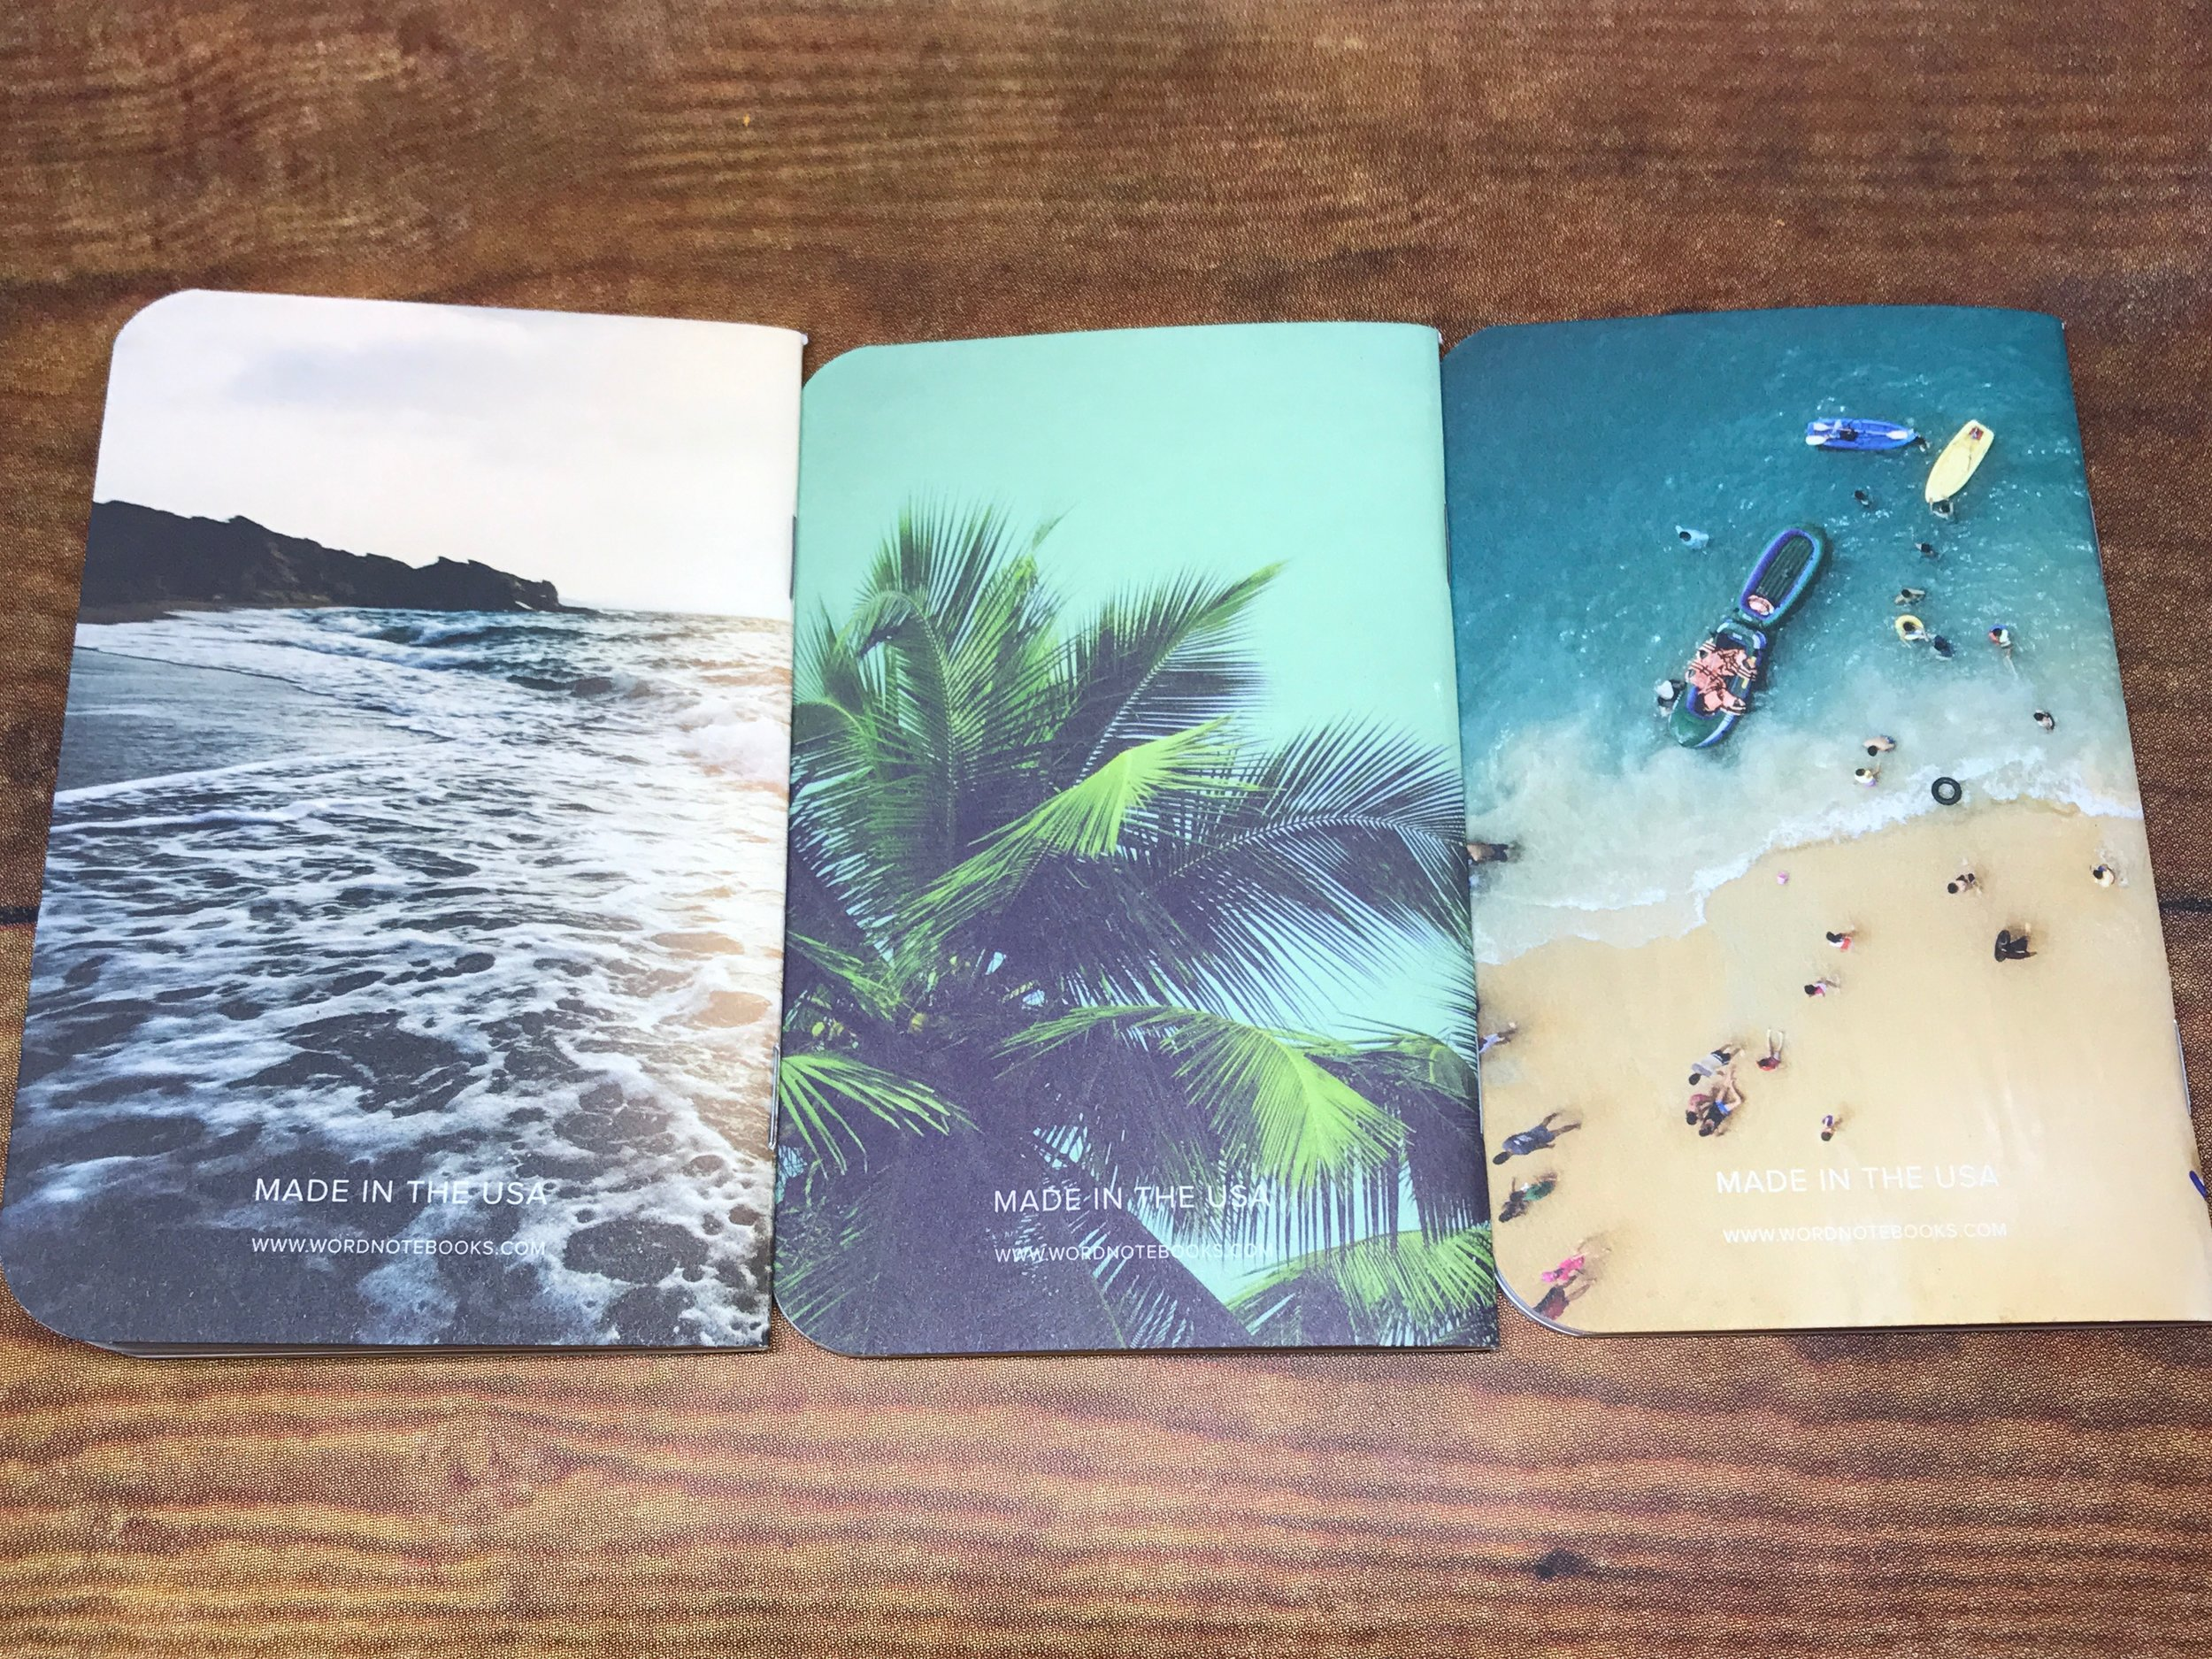 word-notebooks-beach-vibes-6.jpg